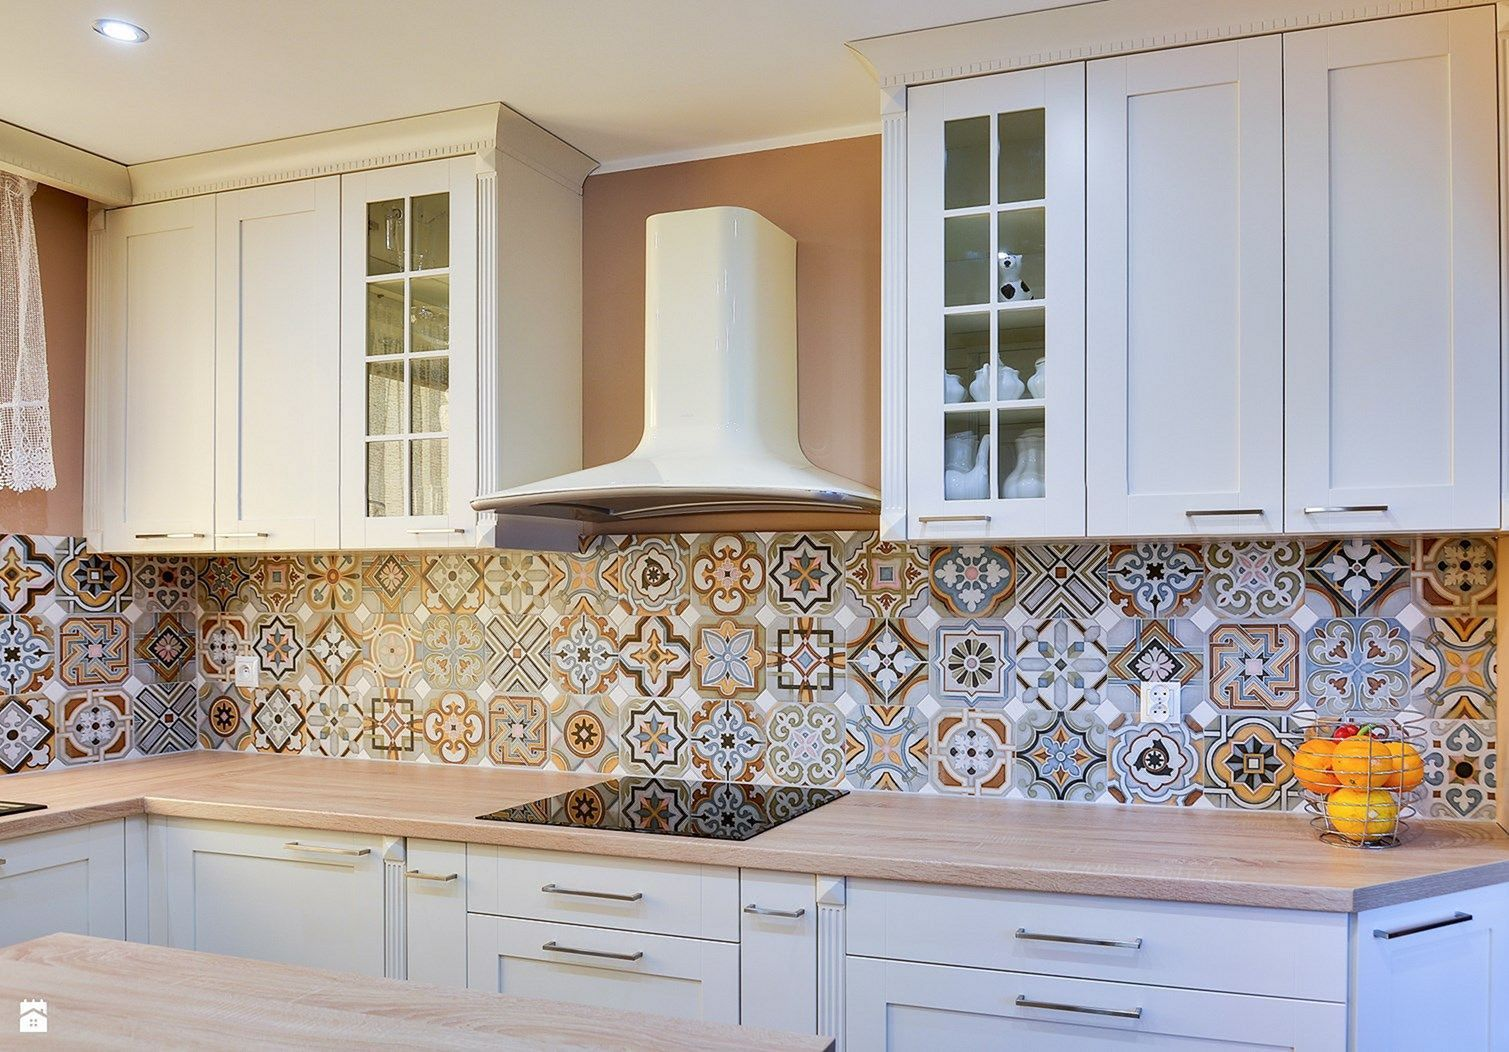 10 Beautiful Backsplash Kitchen Design For Fun Cooking Ideas Kitchen Backsplash Trends Kitchen Backsplash Designs Mosaic Tile Kitchen